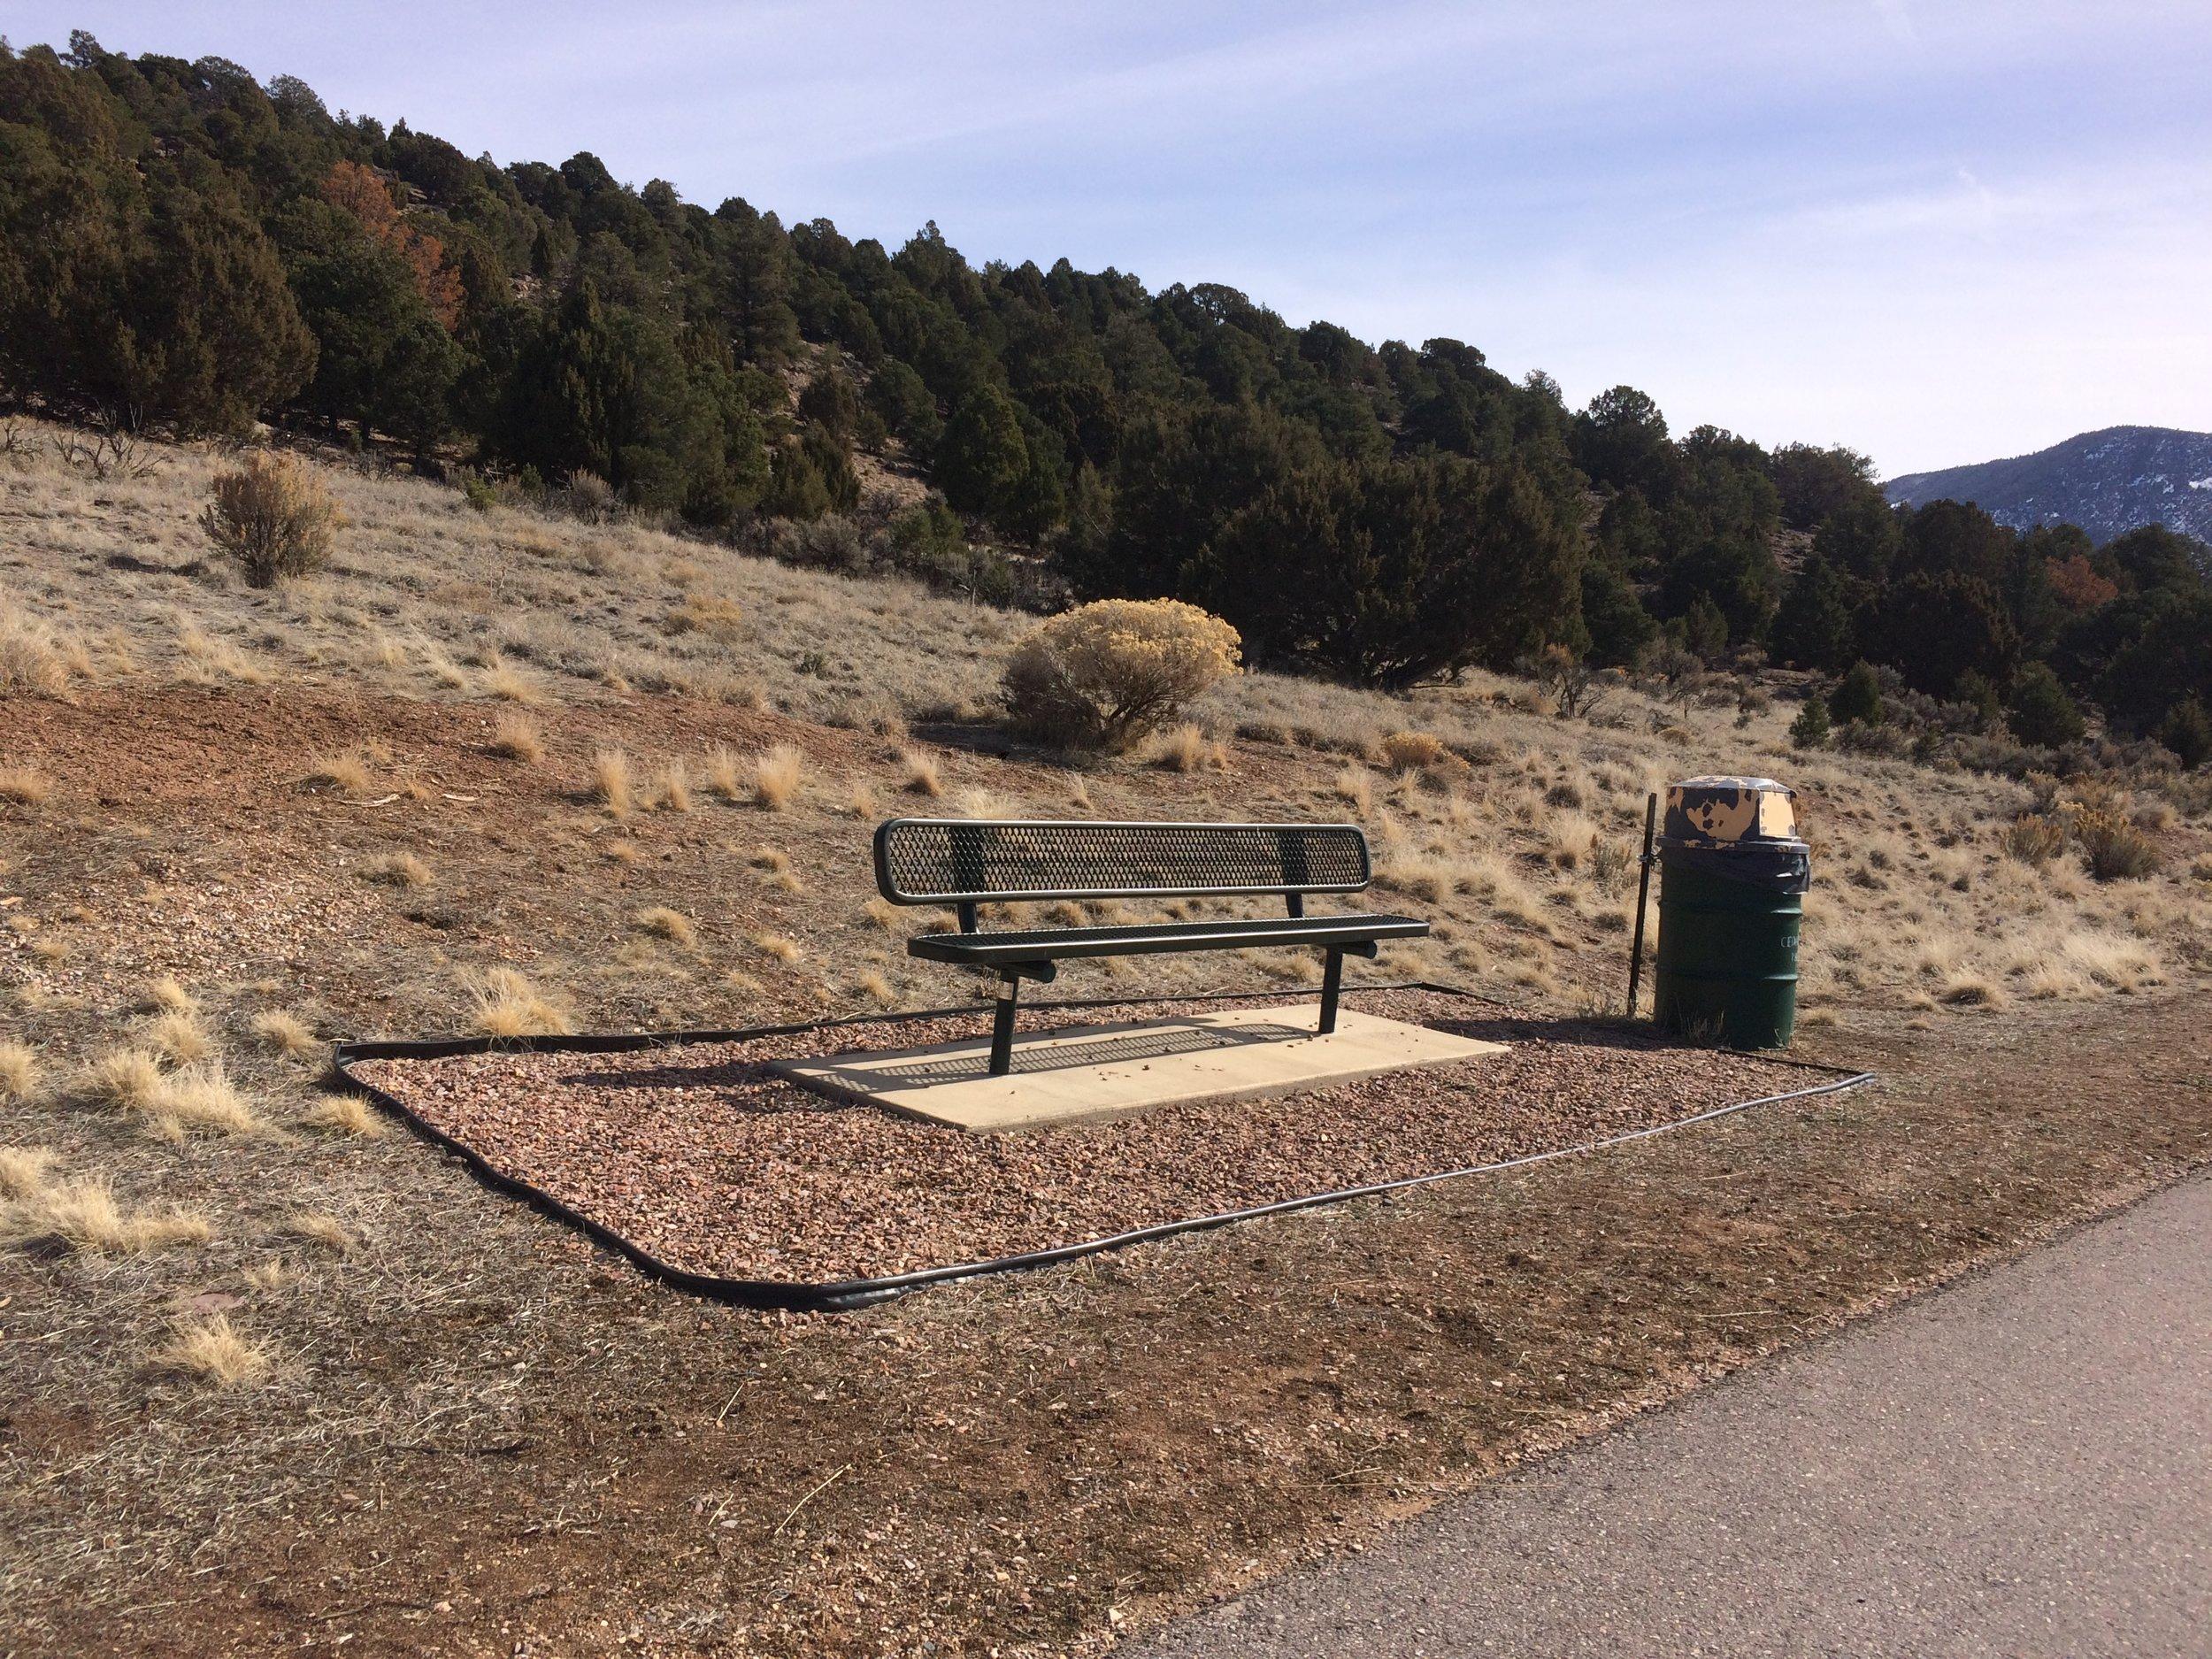 Half-way point bench